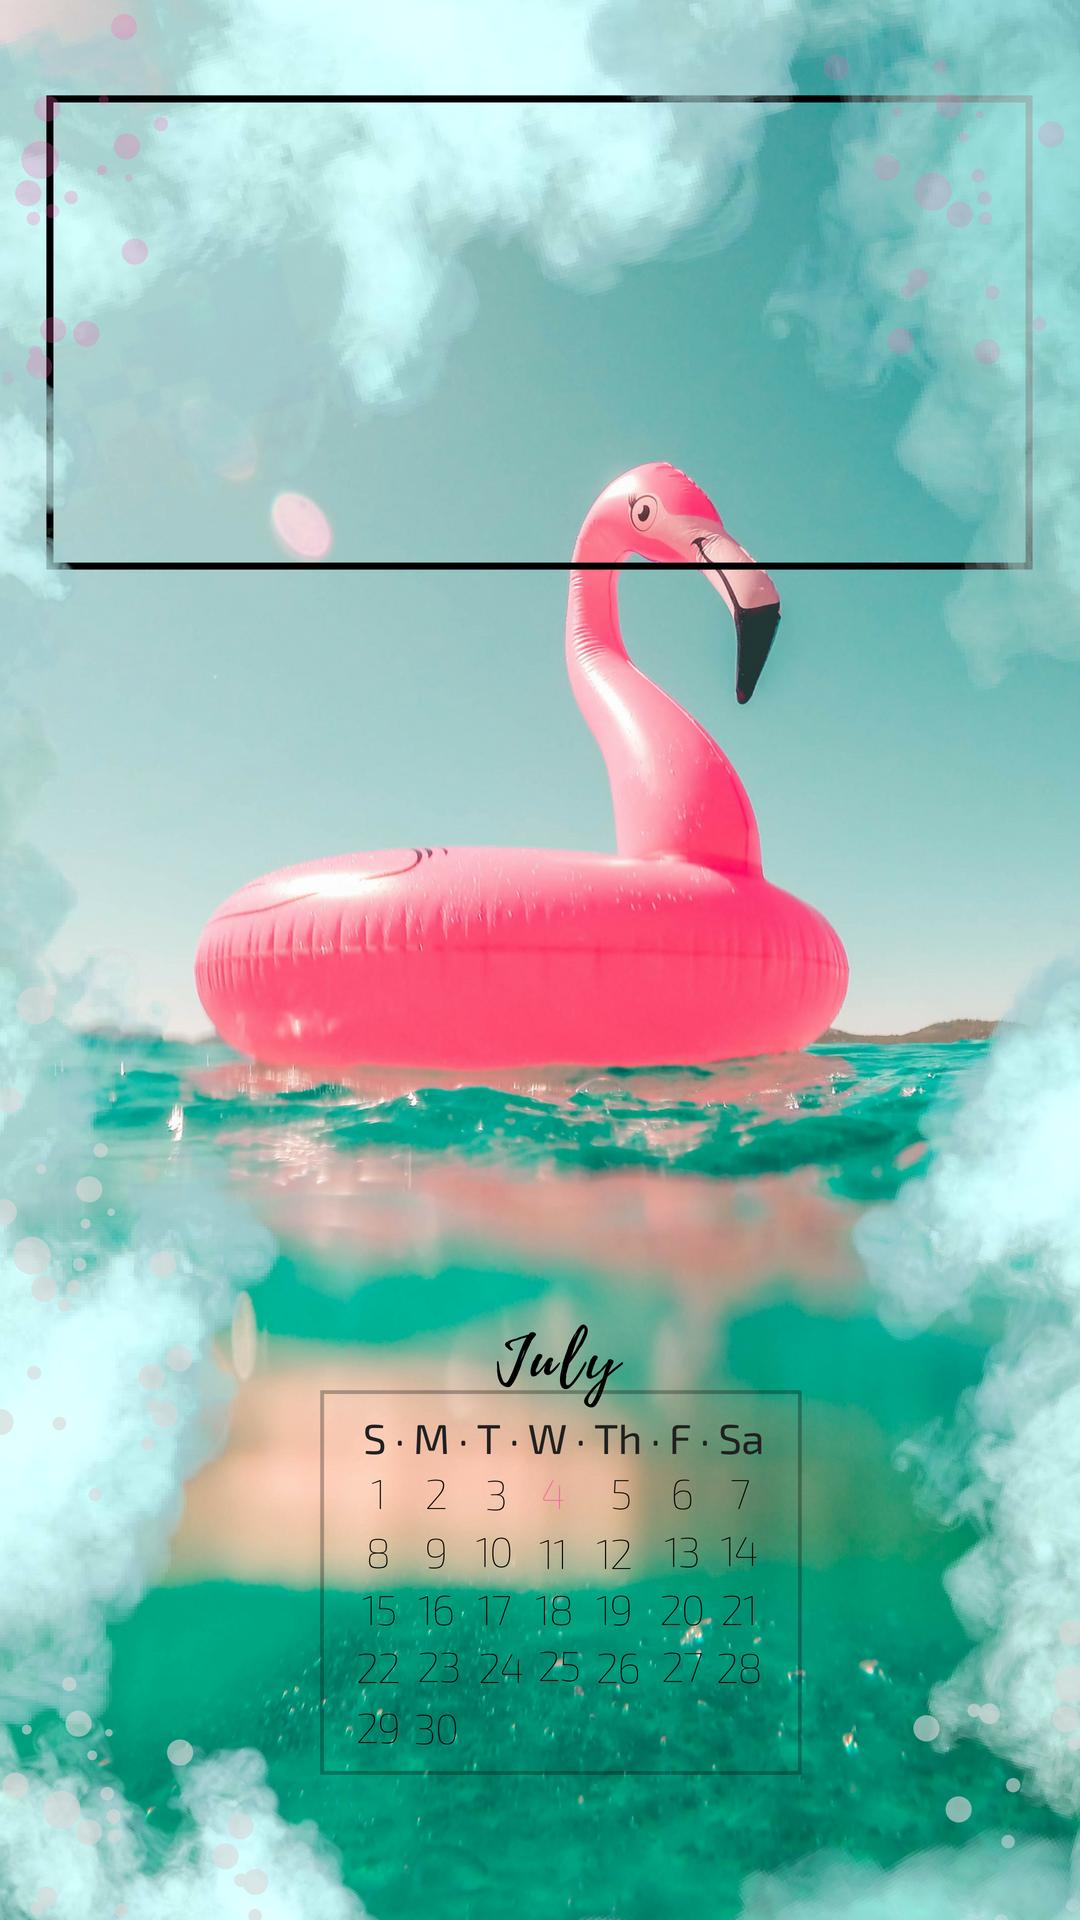 Free Iphone Wallpaper Pink Flamingo Diamond Diva